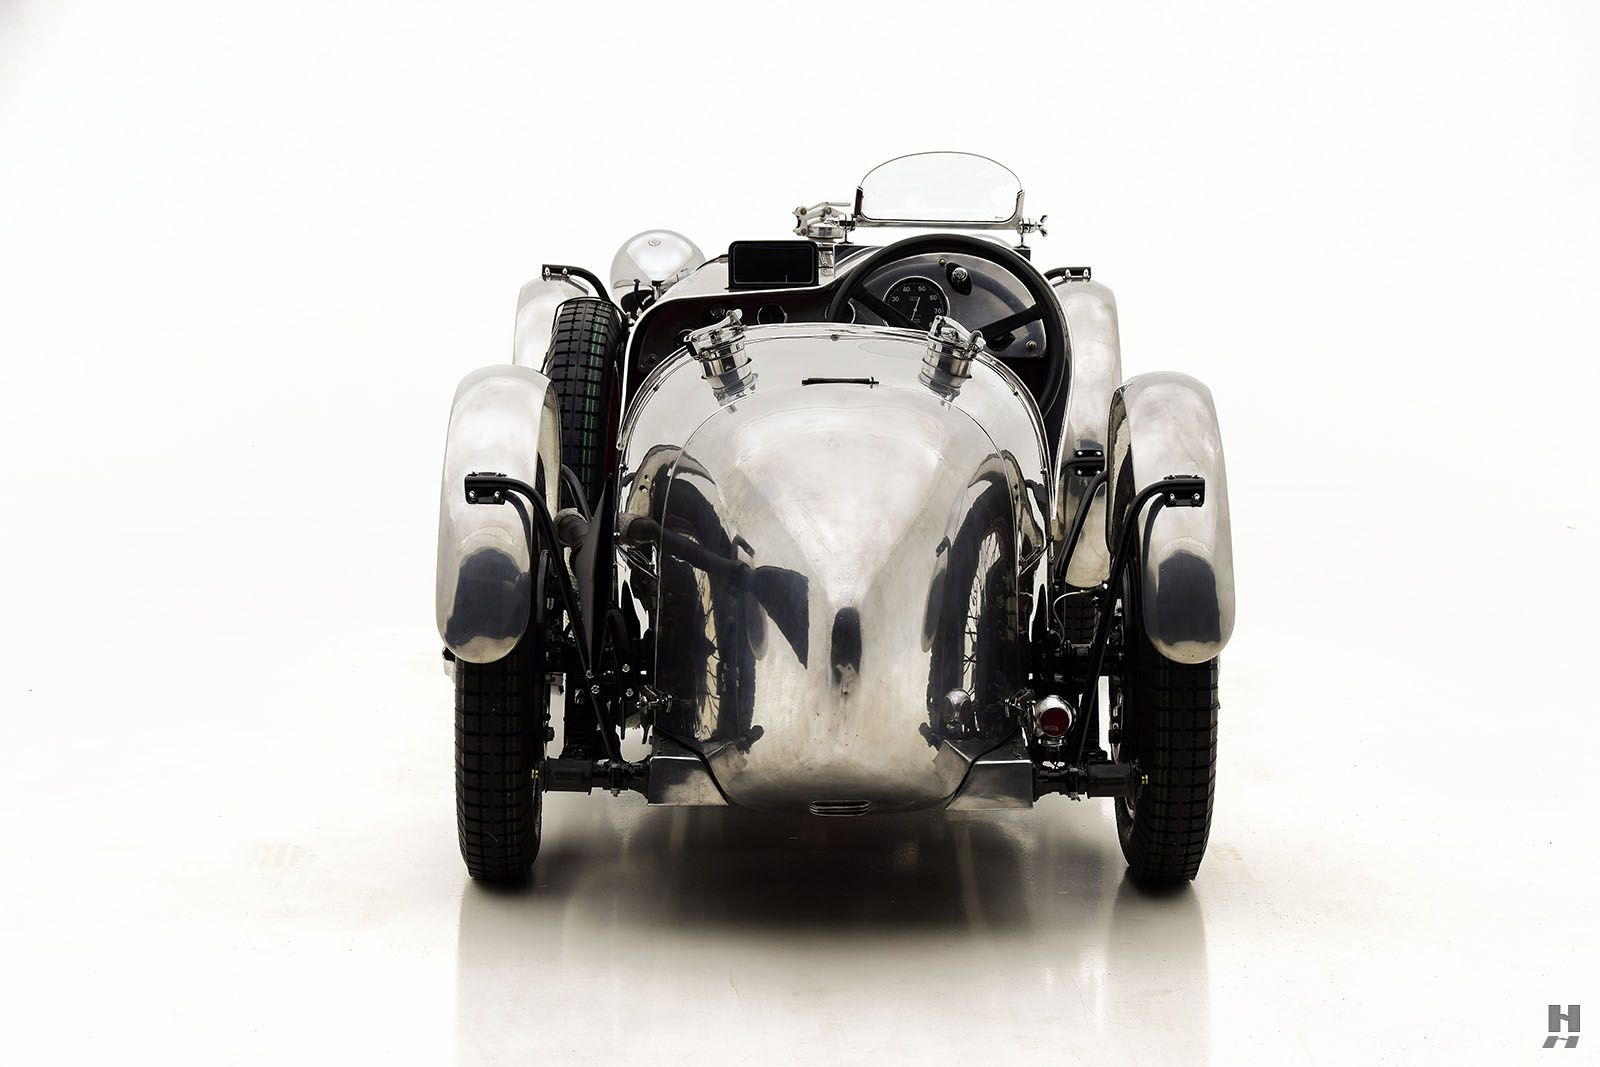 1936 MG PB Roadster Classic Car For Sale | Buy 1936 MG PB Roadster ...